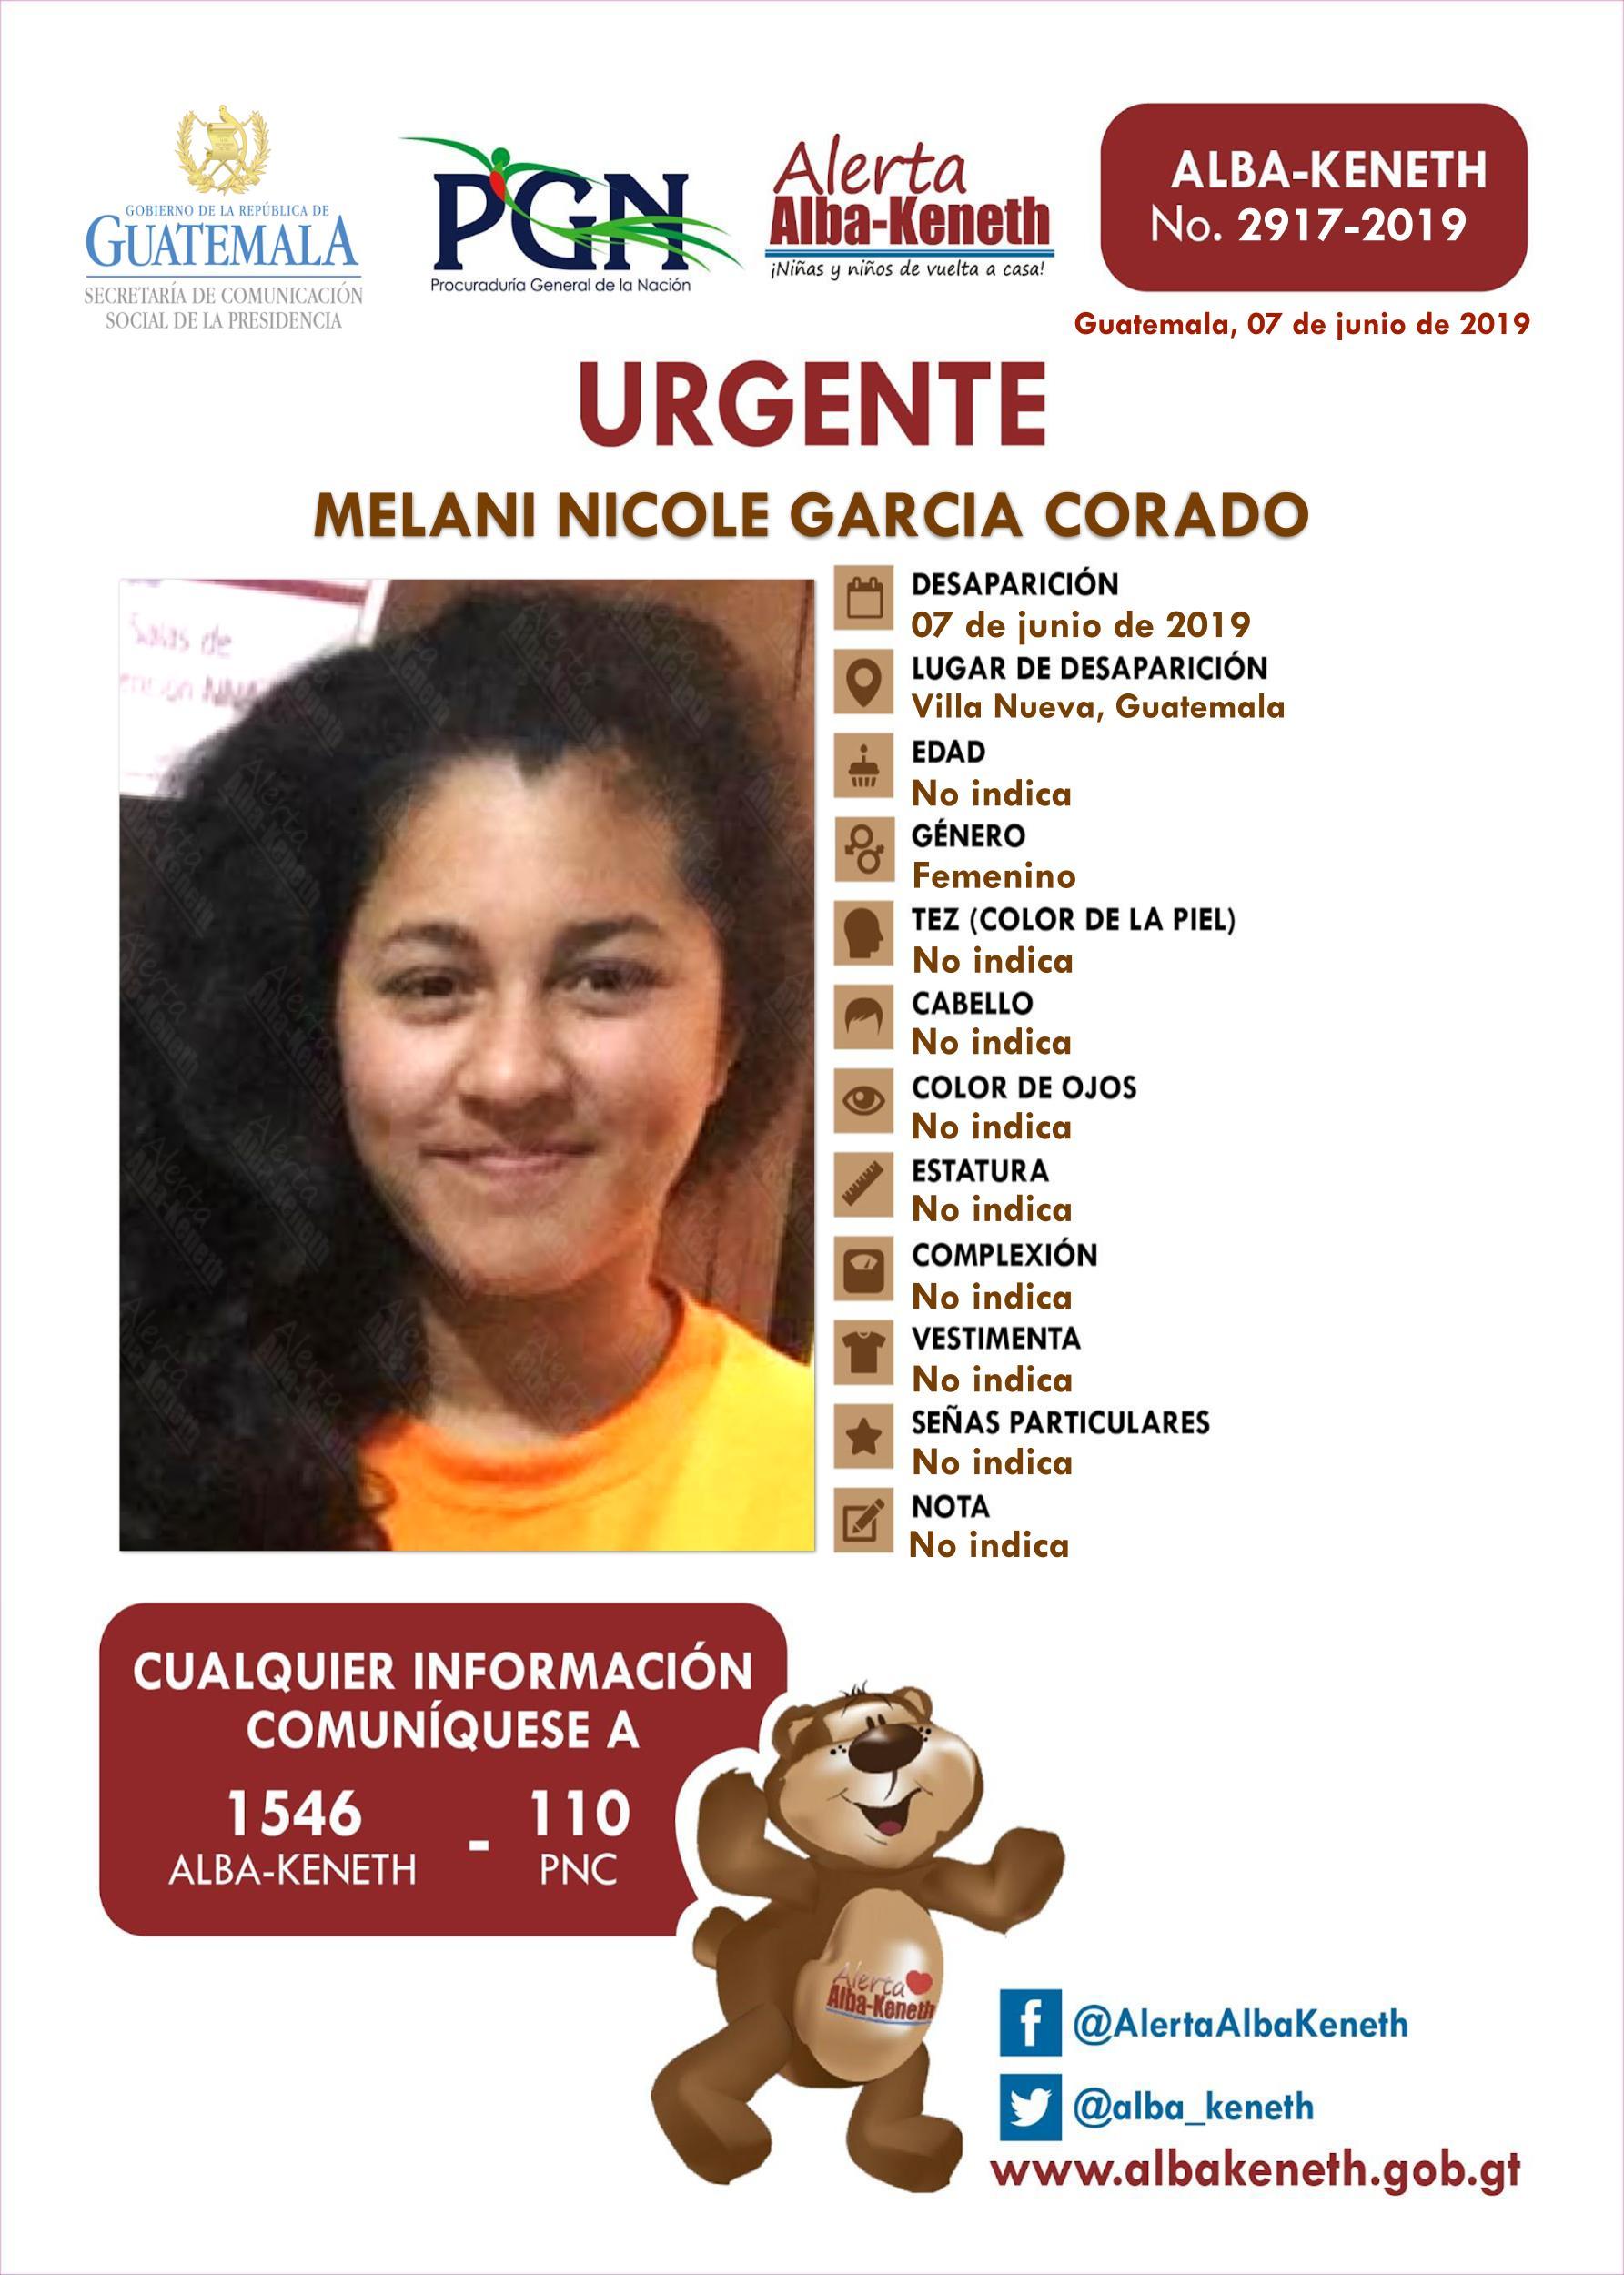 Melani Nicole Garcia Corado